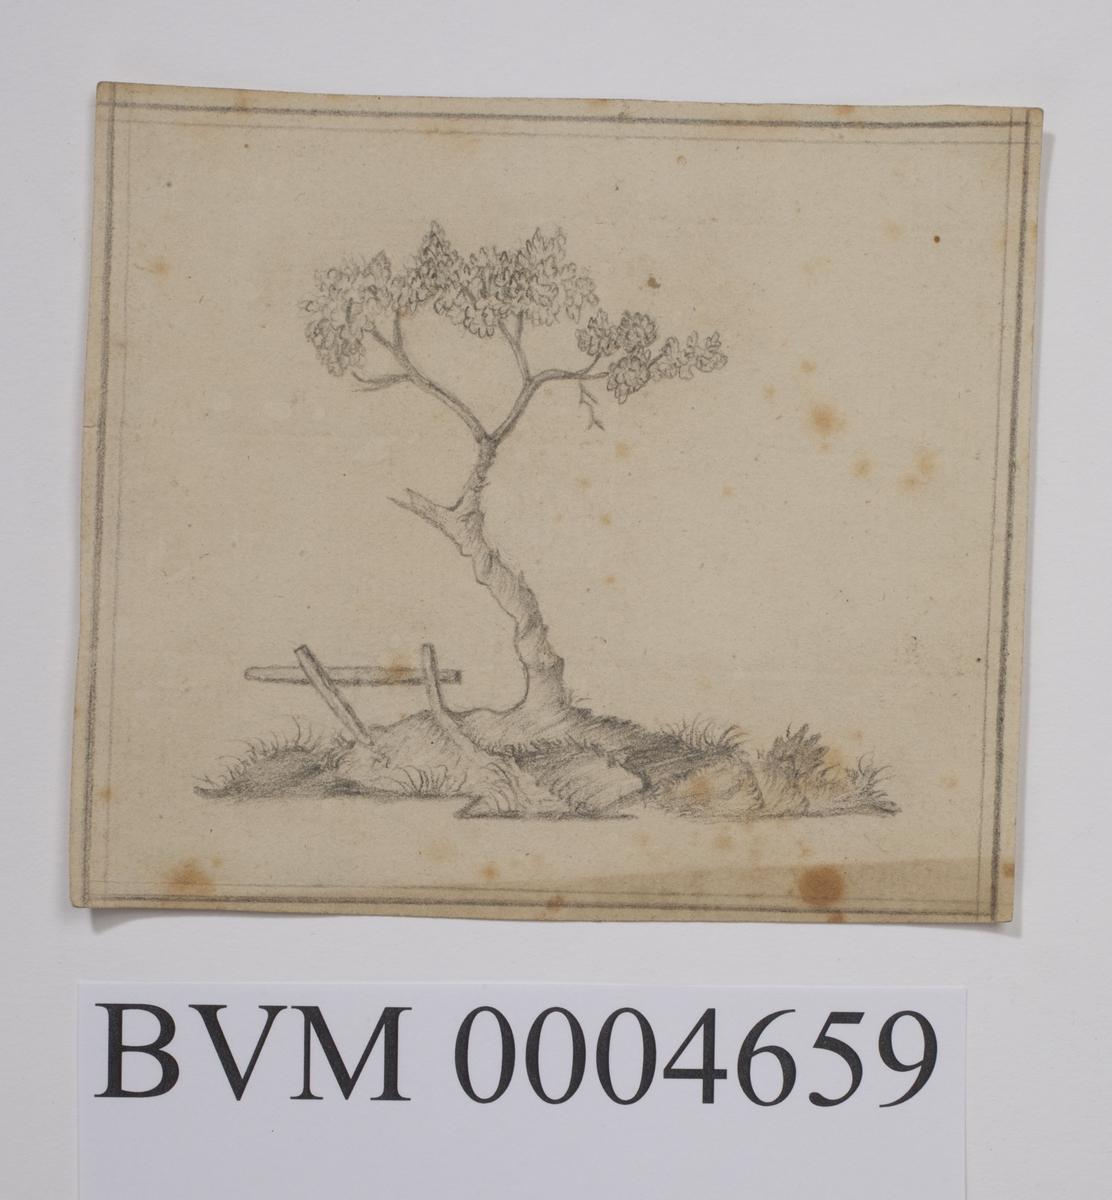 Blyanttegning av landskap med tre.